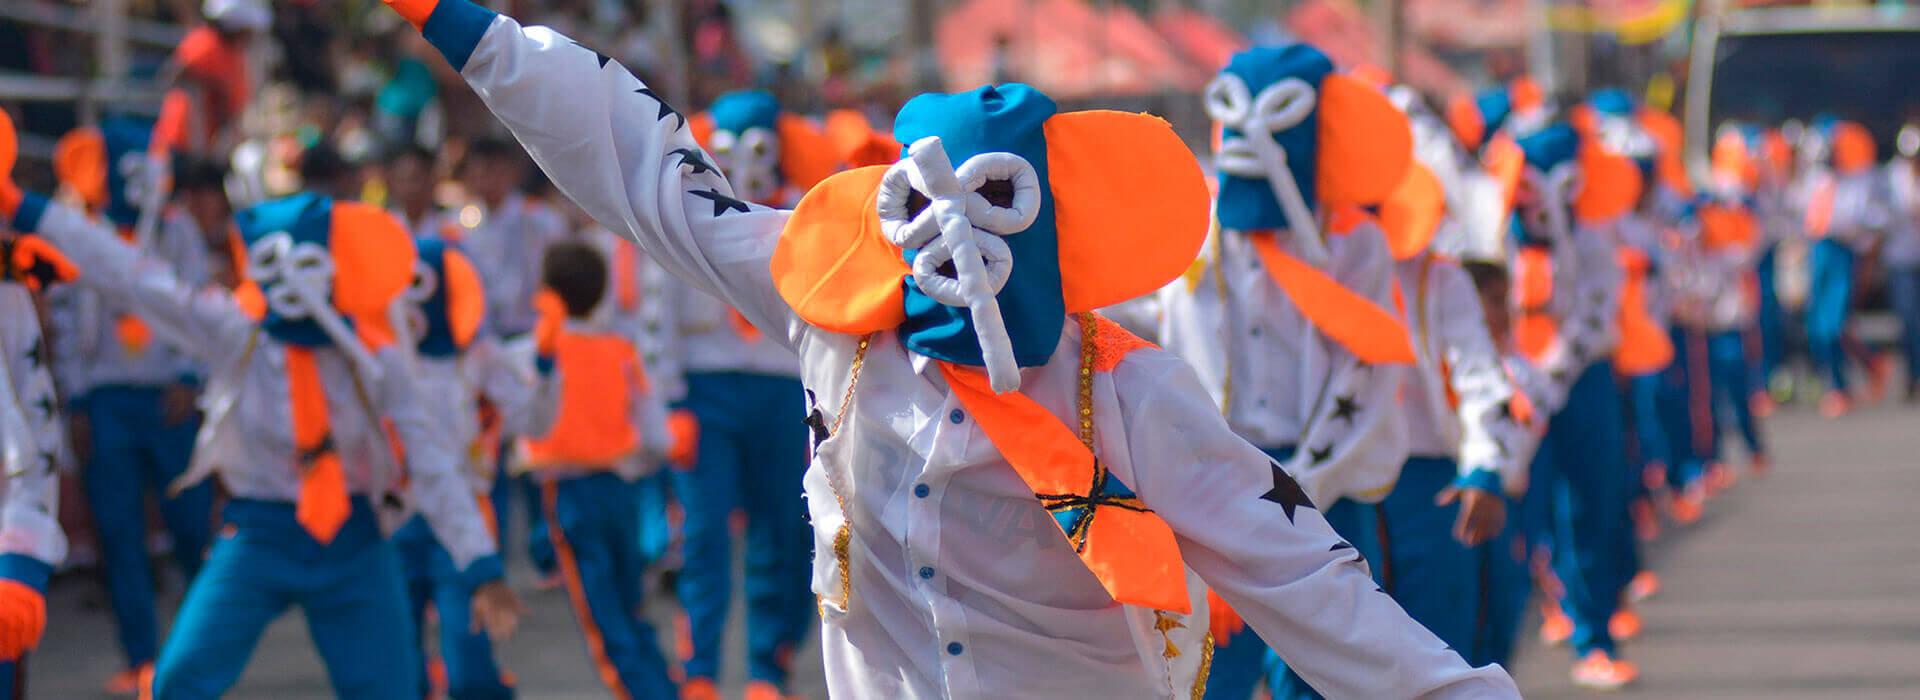 Barranquilla Carnival Tour 11 Days